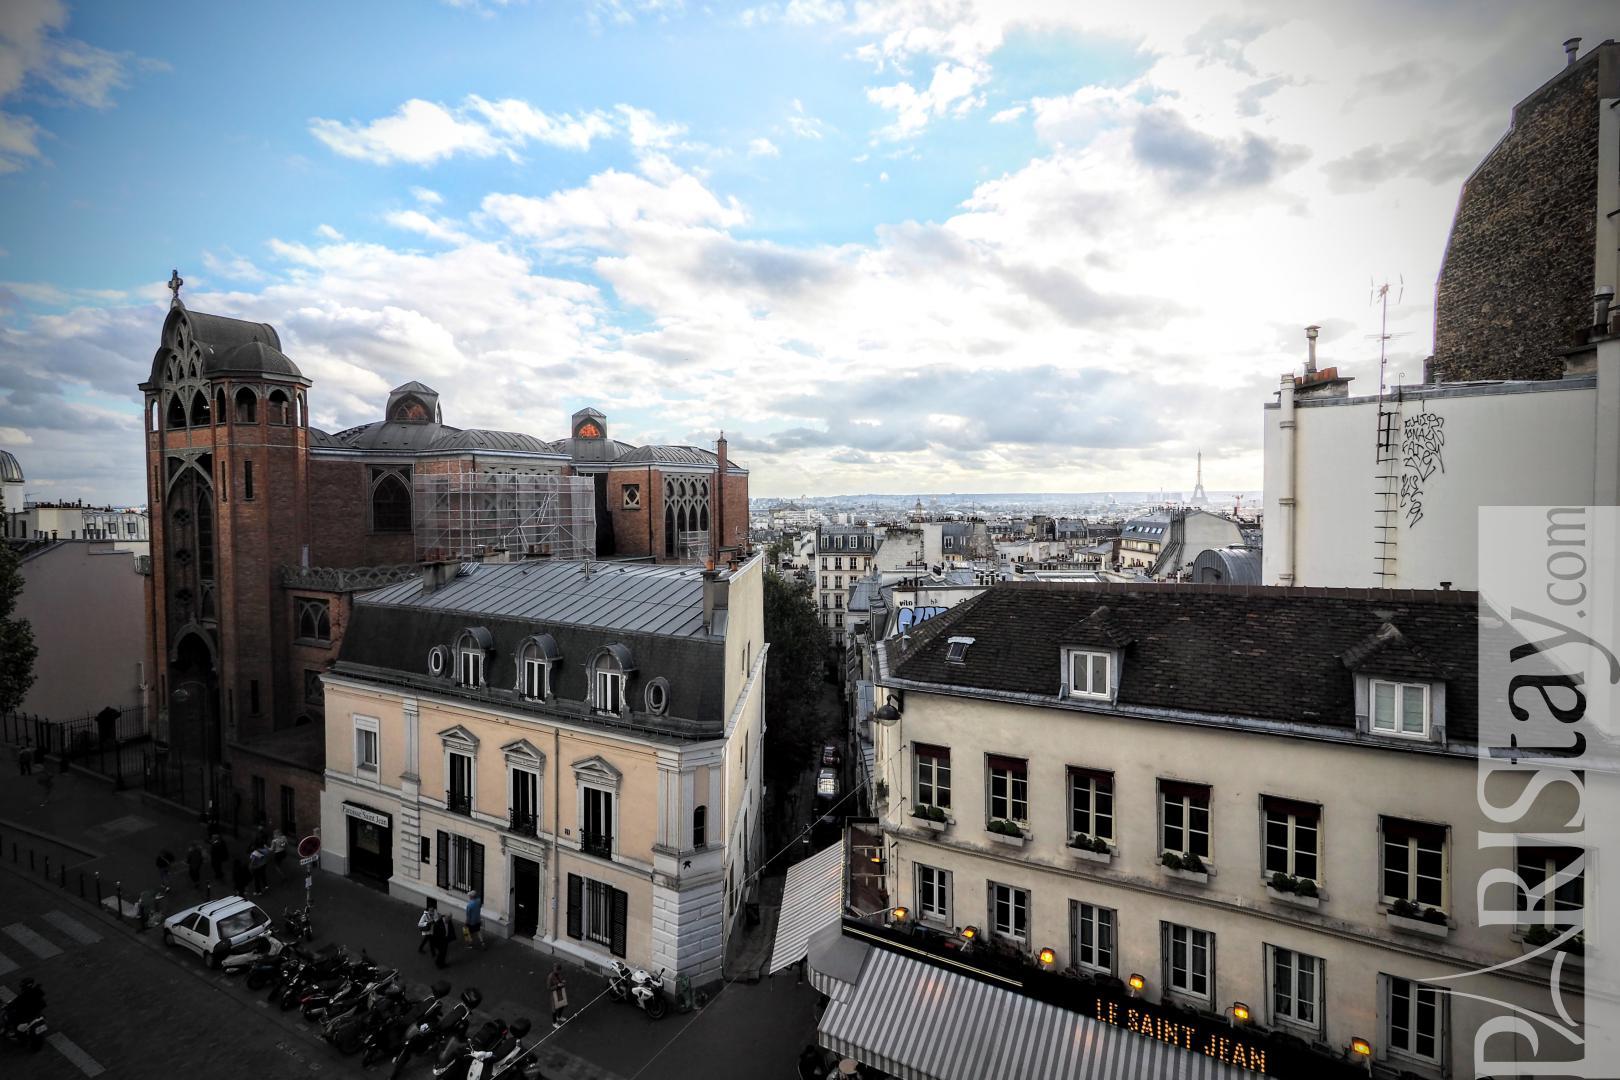 Paris flat for rent Montmartre one bedroom apartment for rent